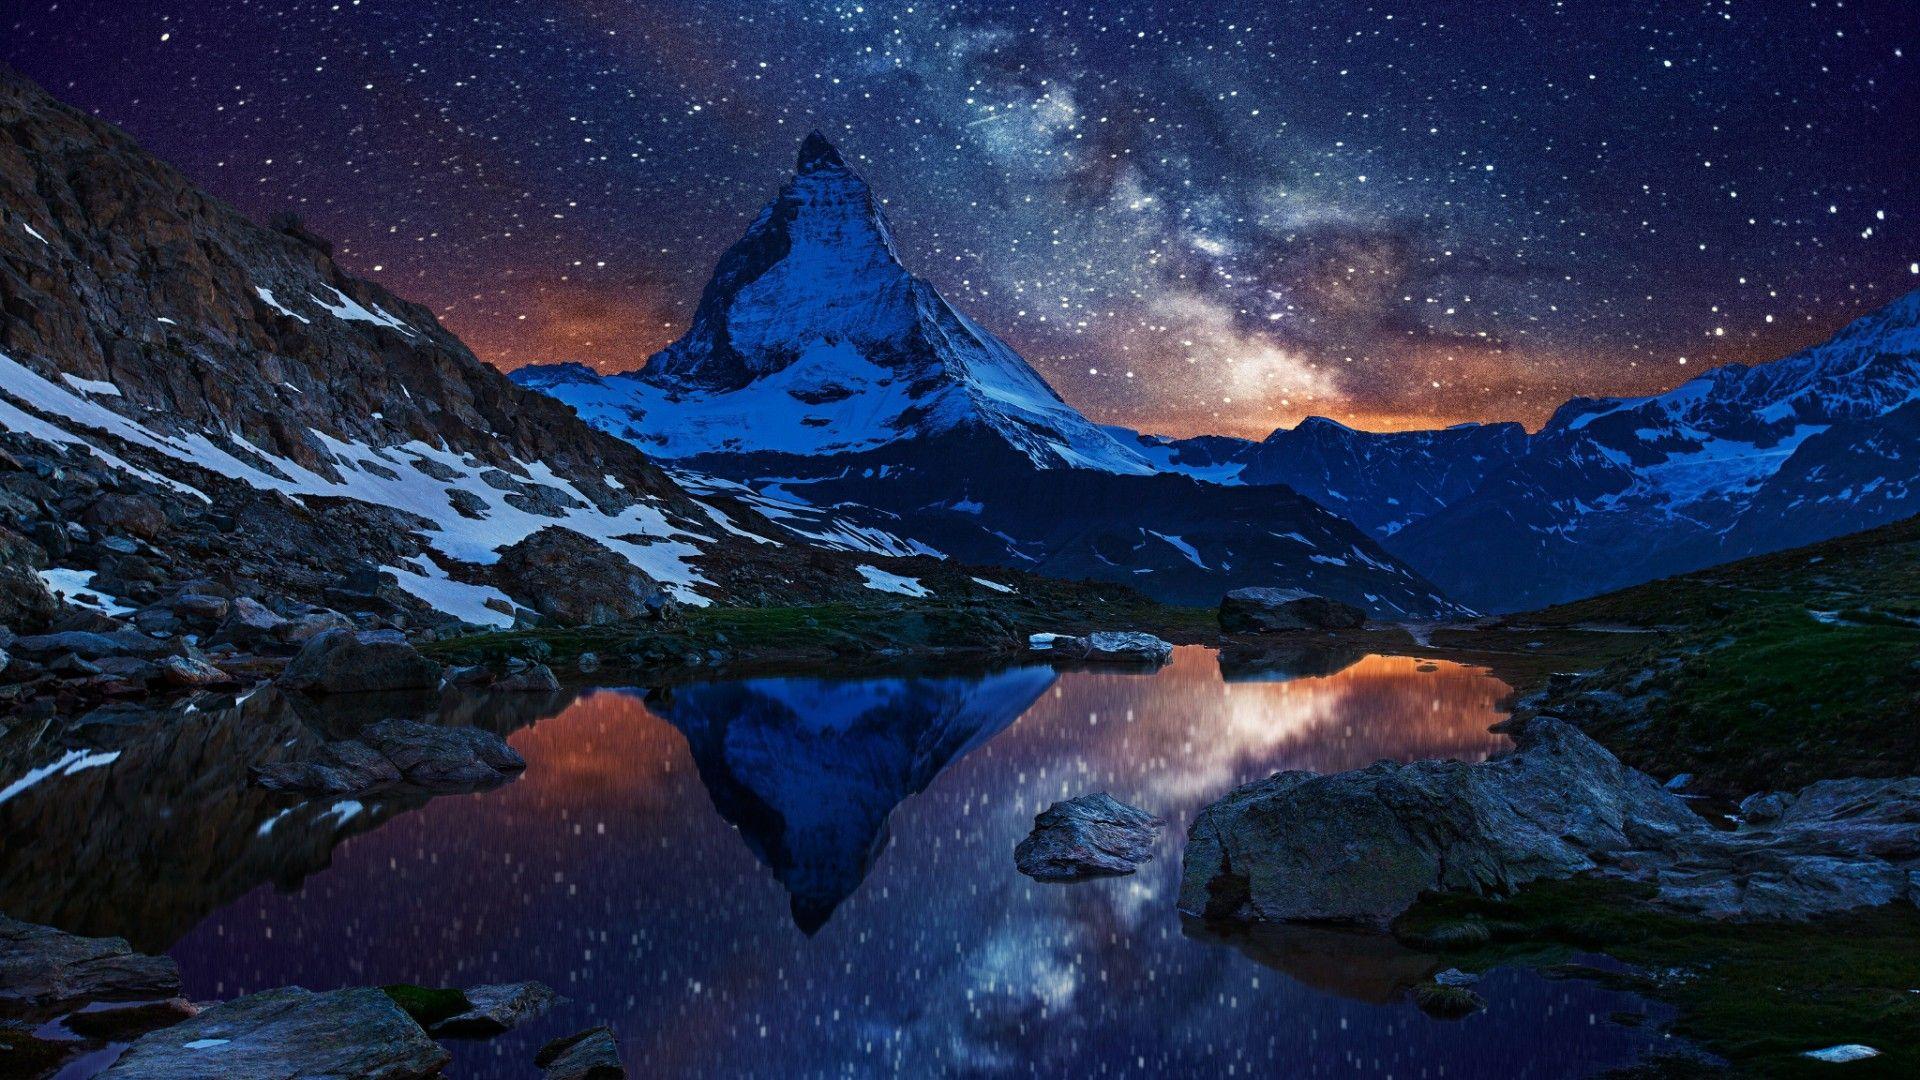 Image Result For Matterhorn Milky Way Switzerland Wallpaper Starry Night Wallpaper Scandinavian Art Print